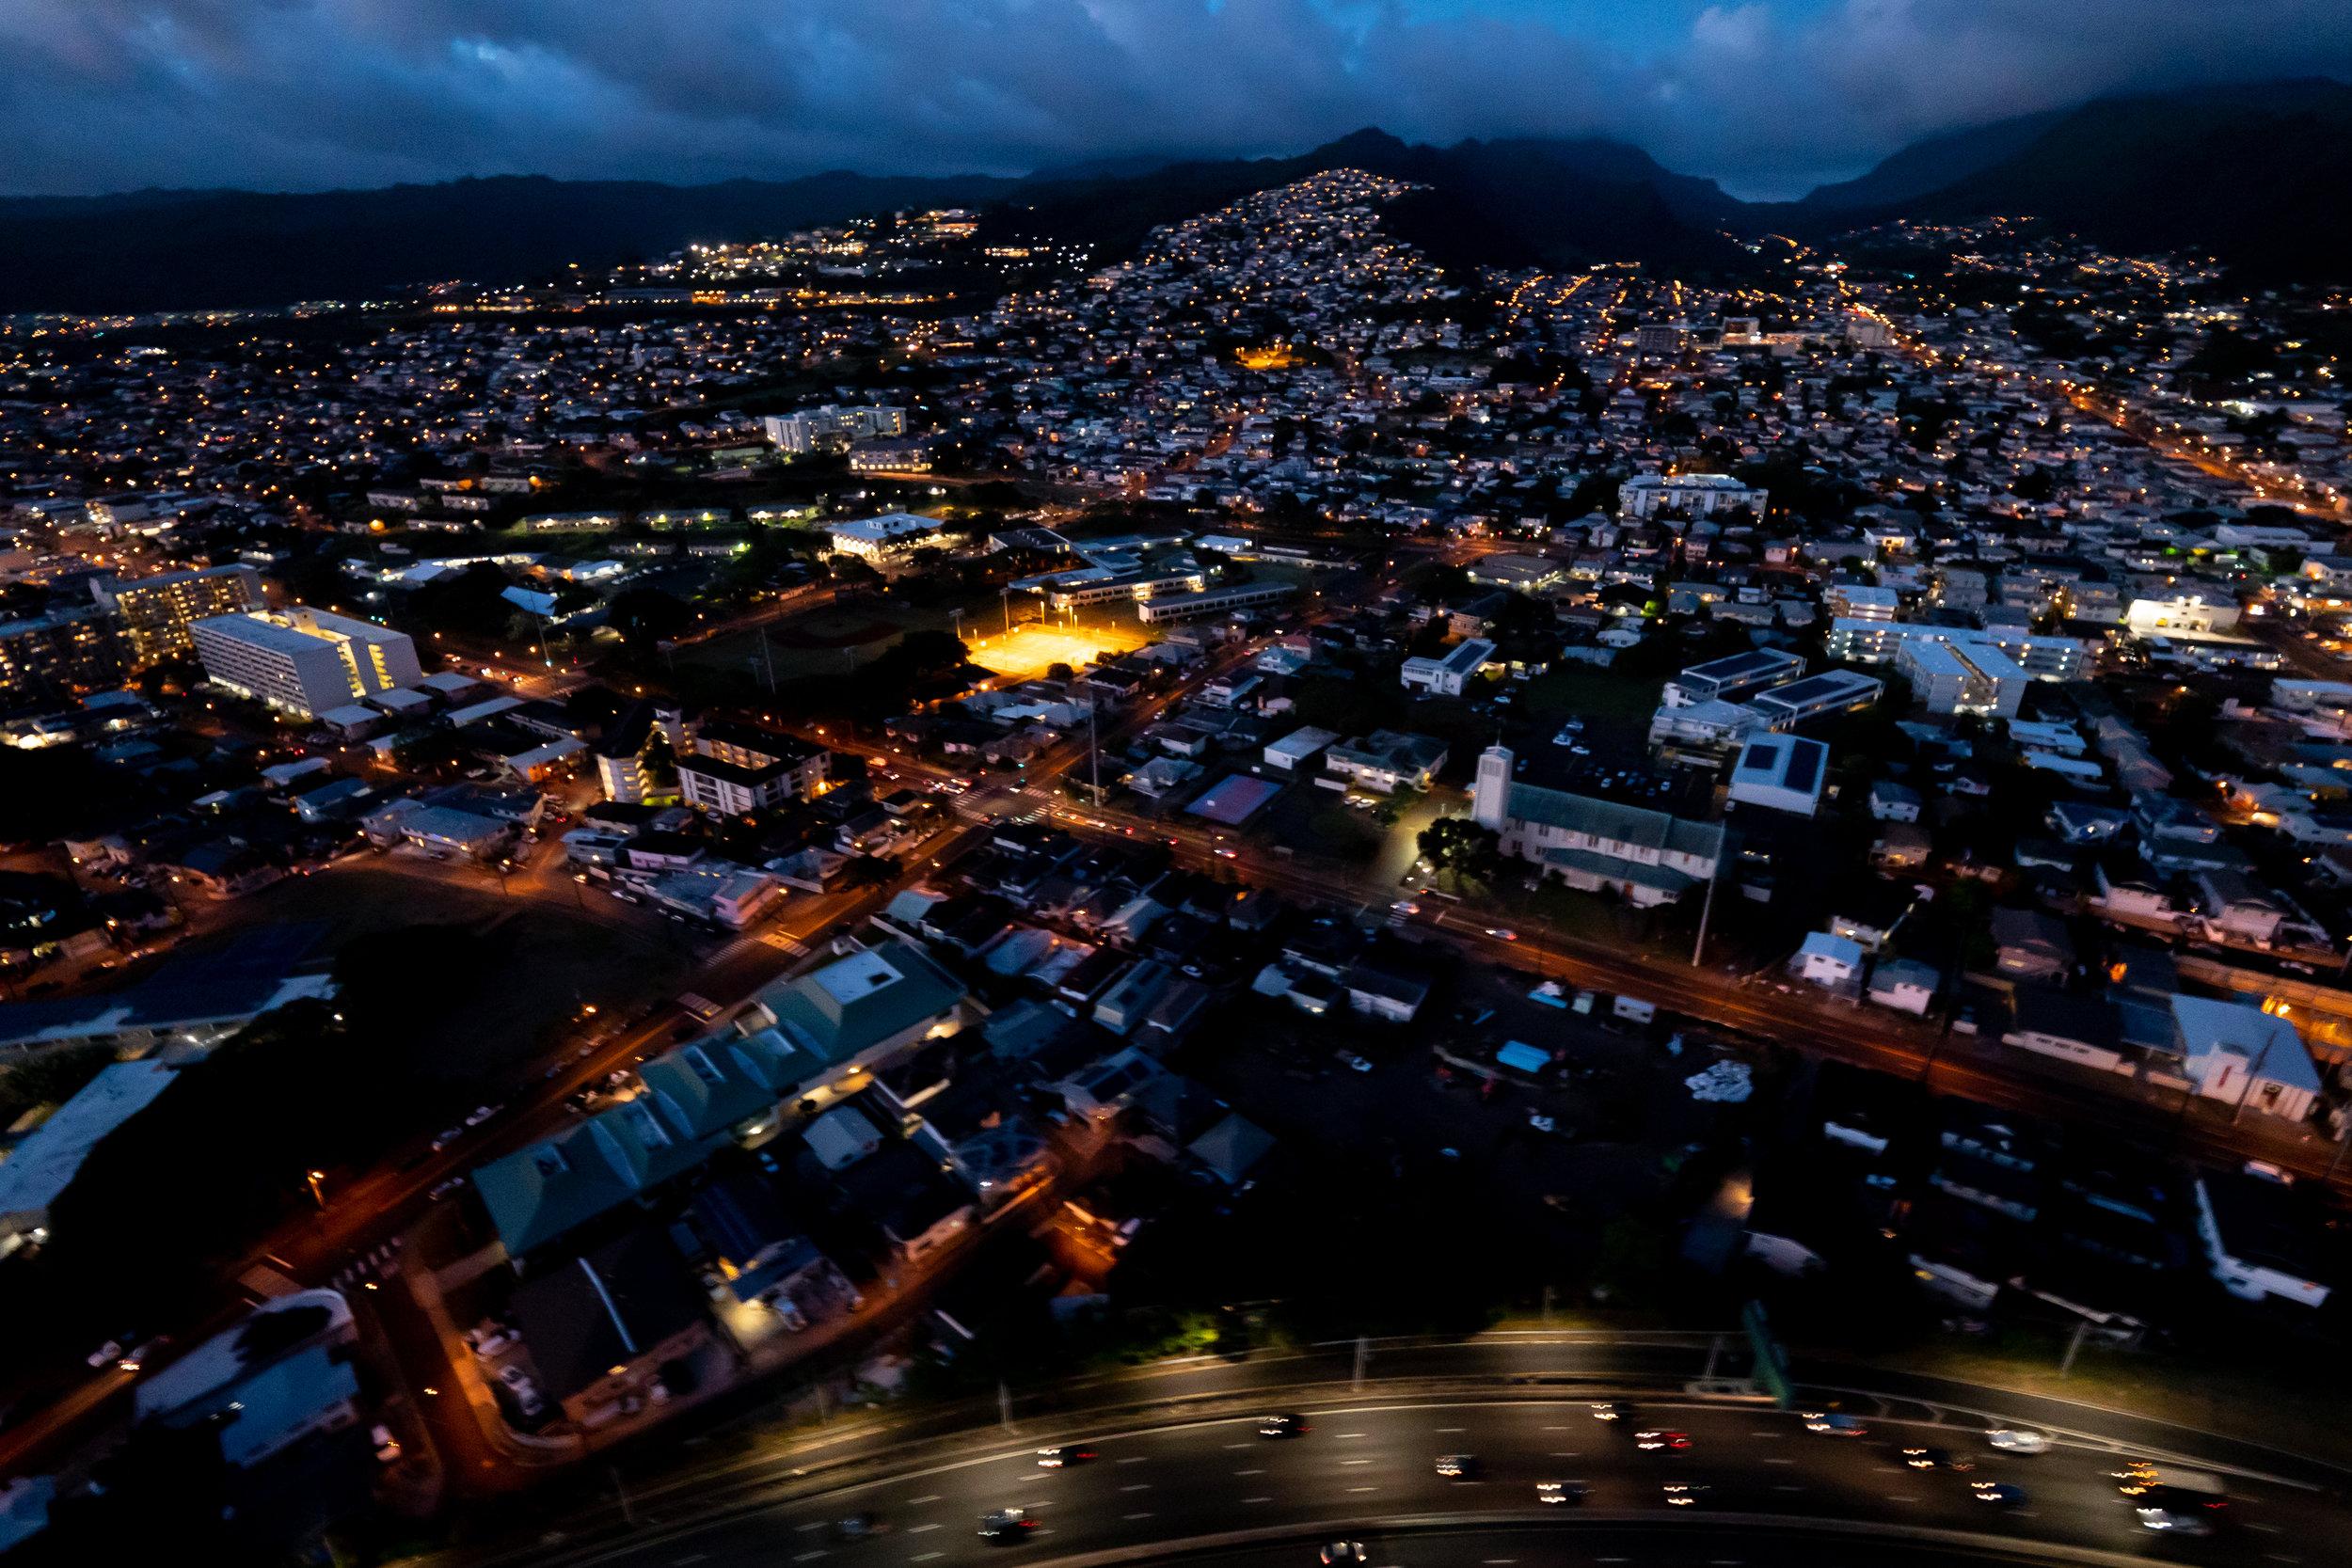 20180601_JohnsonControls_Aerial_Honolulu-5868.jpg